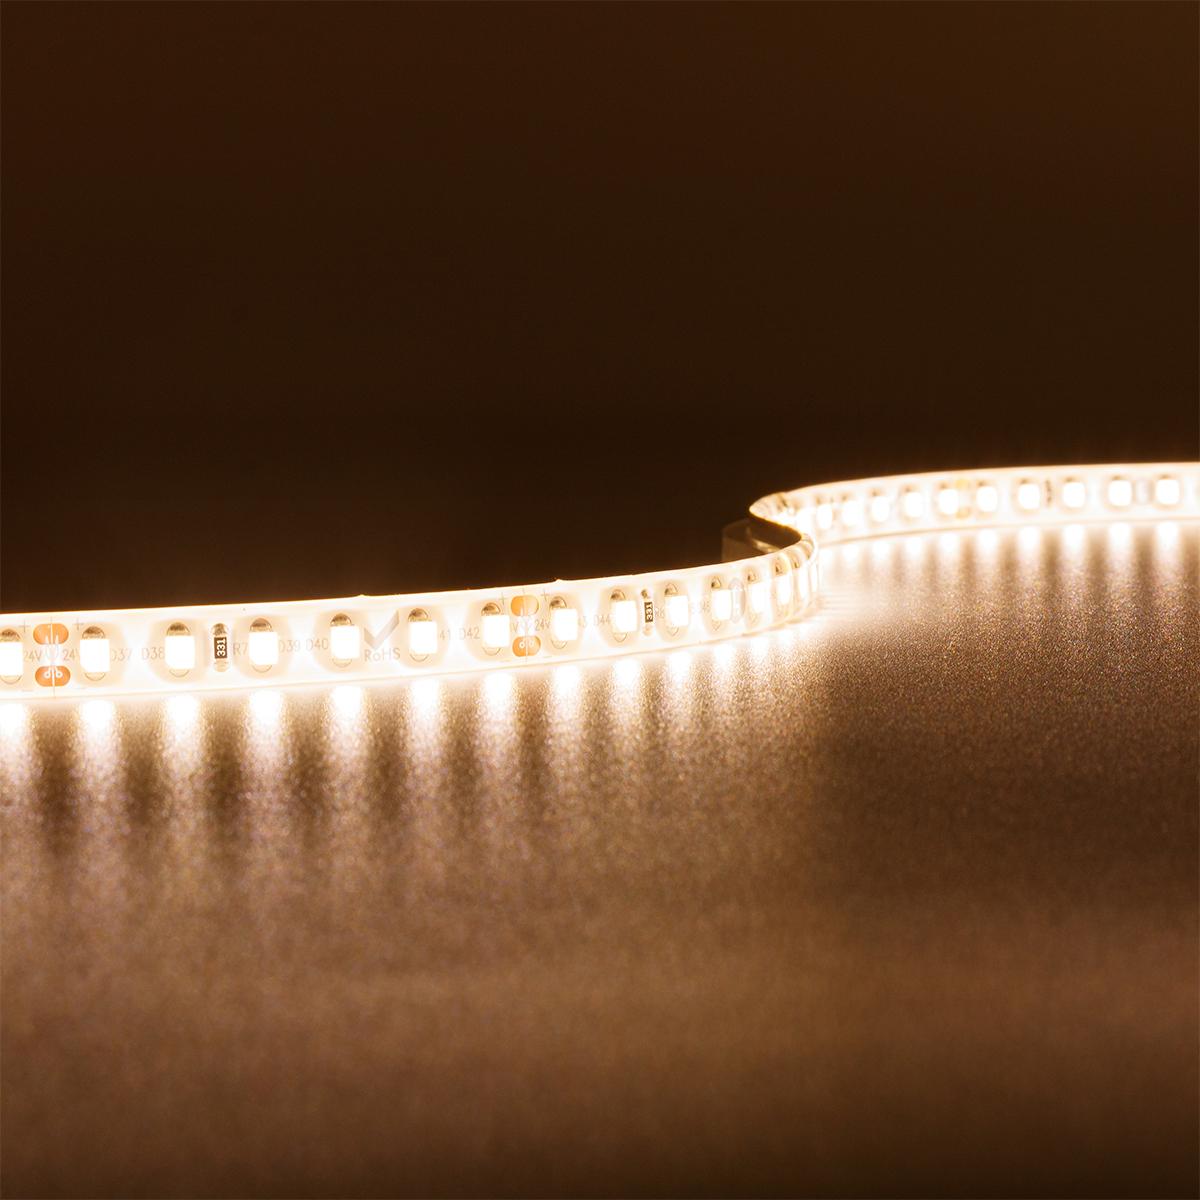 Strip Warmweiß 24V LED Streifen 5M 9,6W/m 120LED/m 8mm IP65 3000K